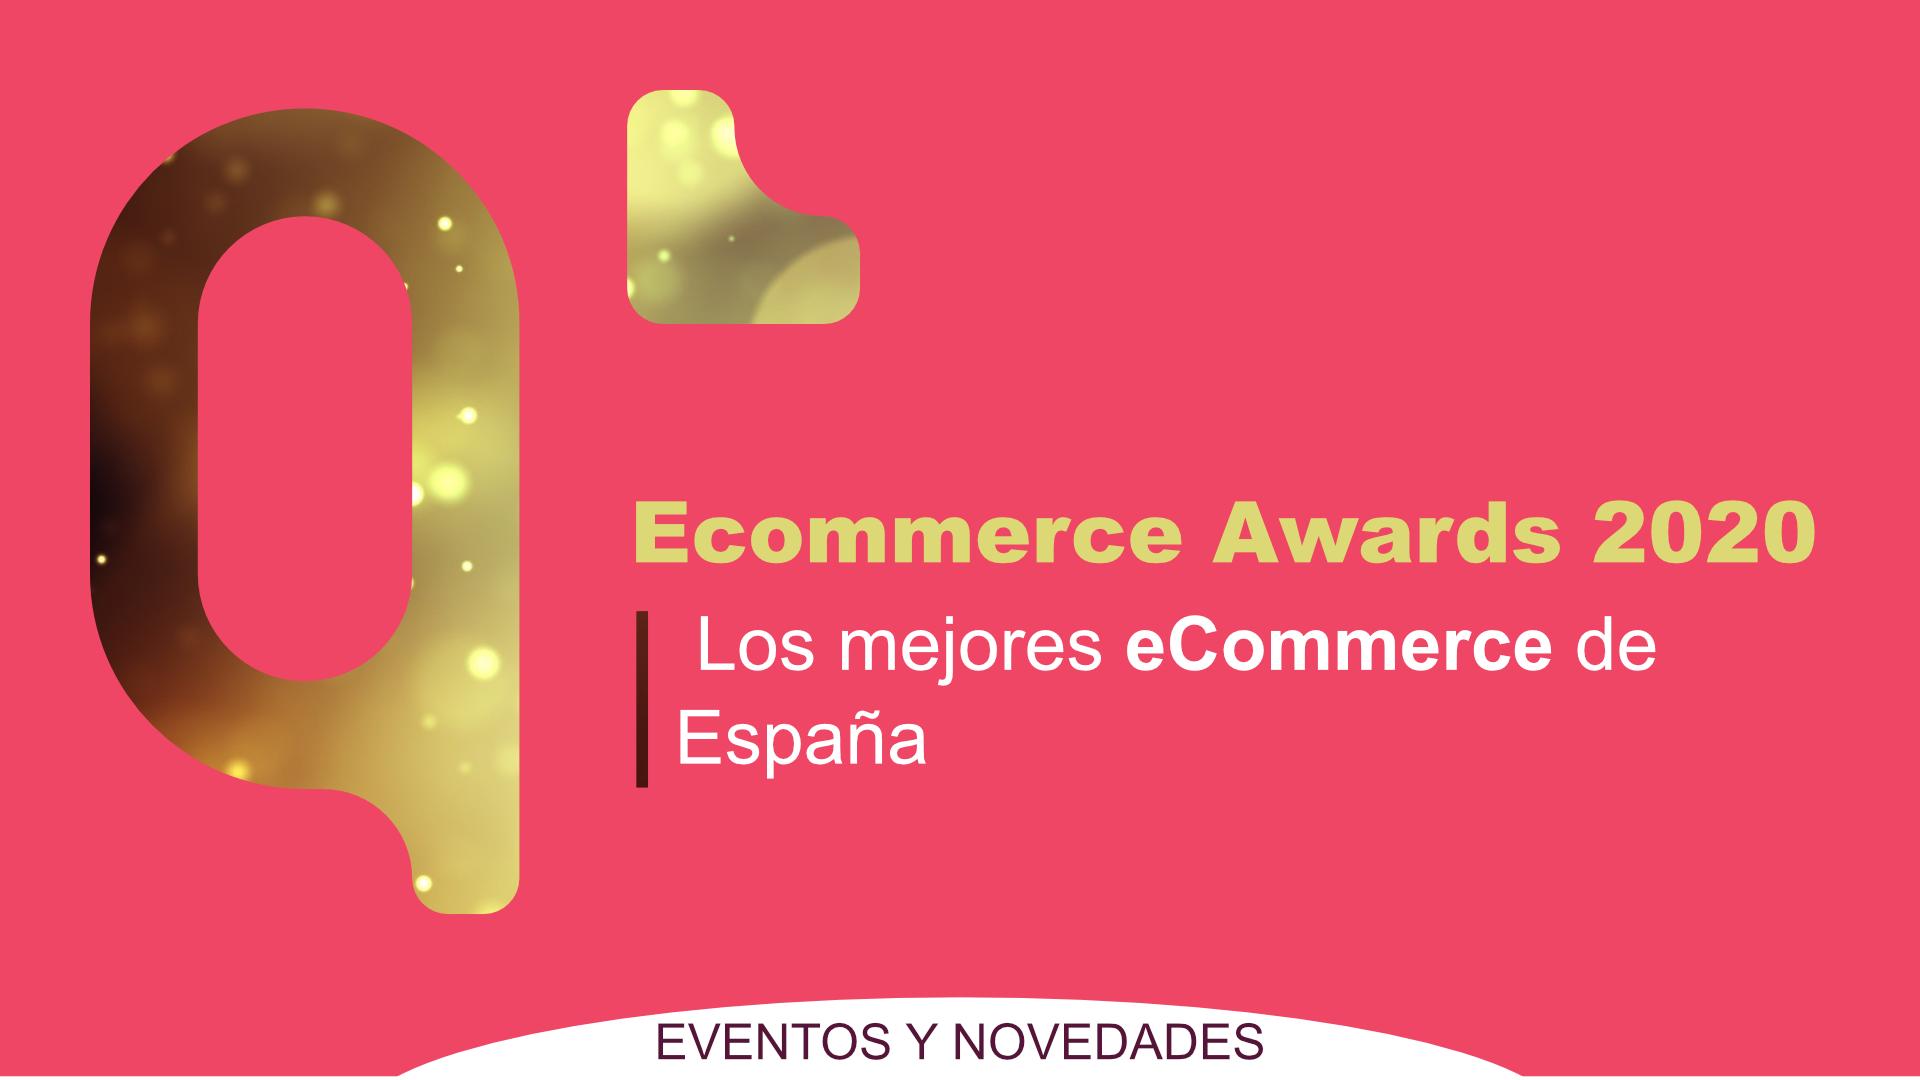 Los mejores eCommerce españoles